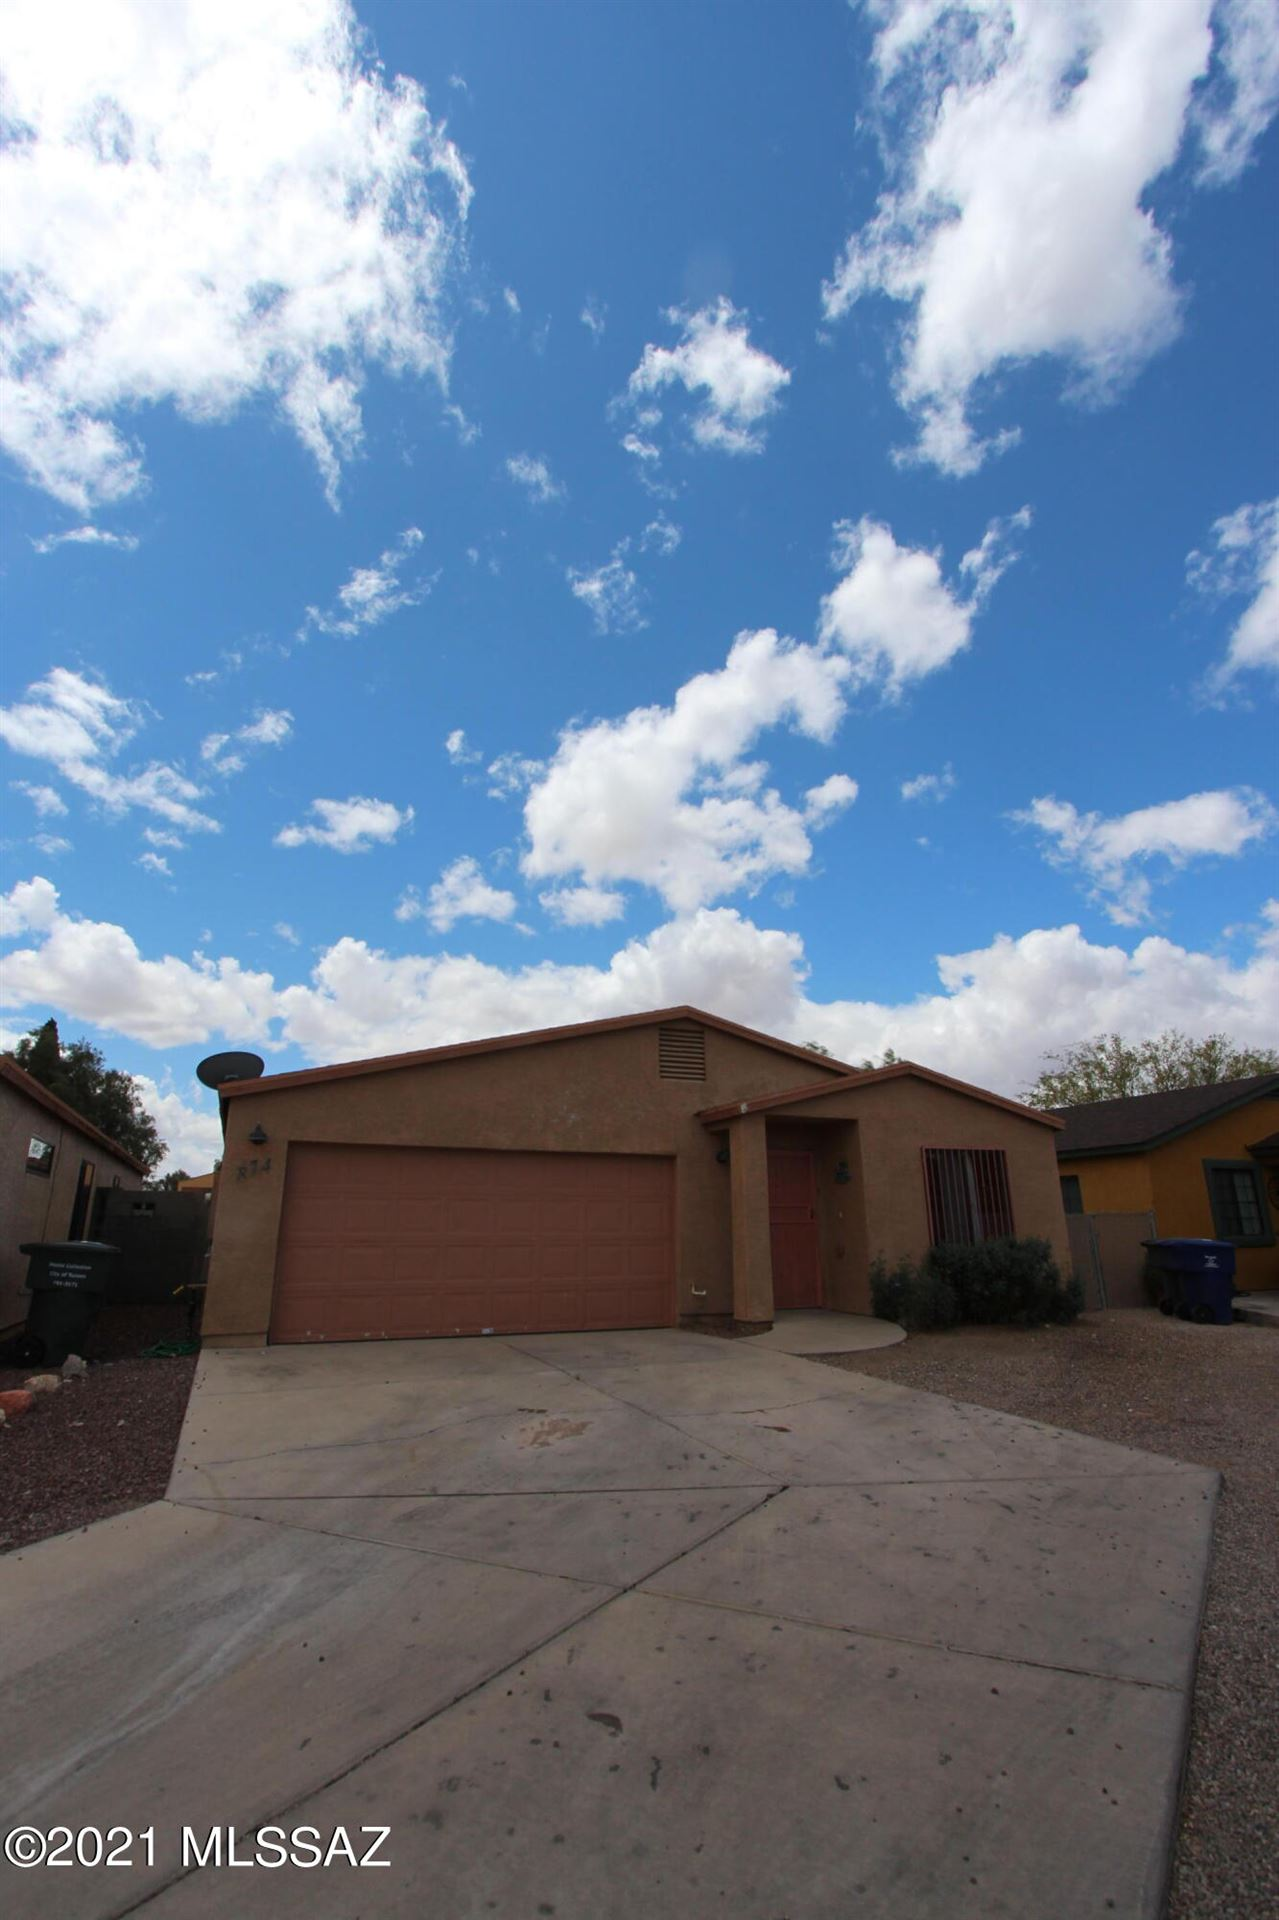 874 E Vuelta Suave, Tucson, AZ 85706 - MLS#: 22111634